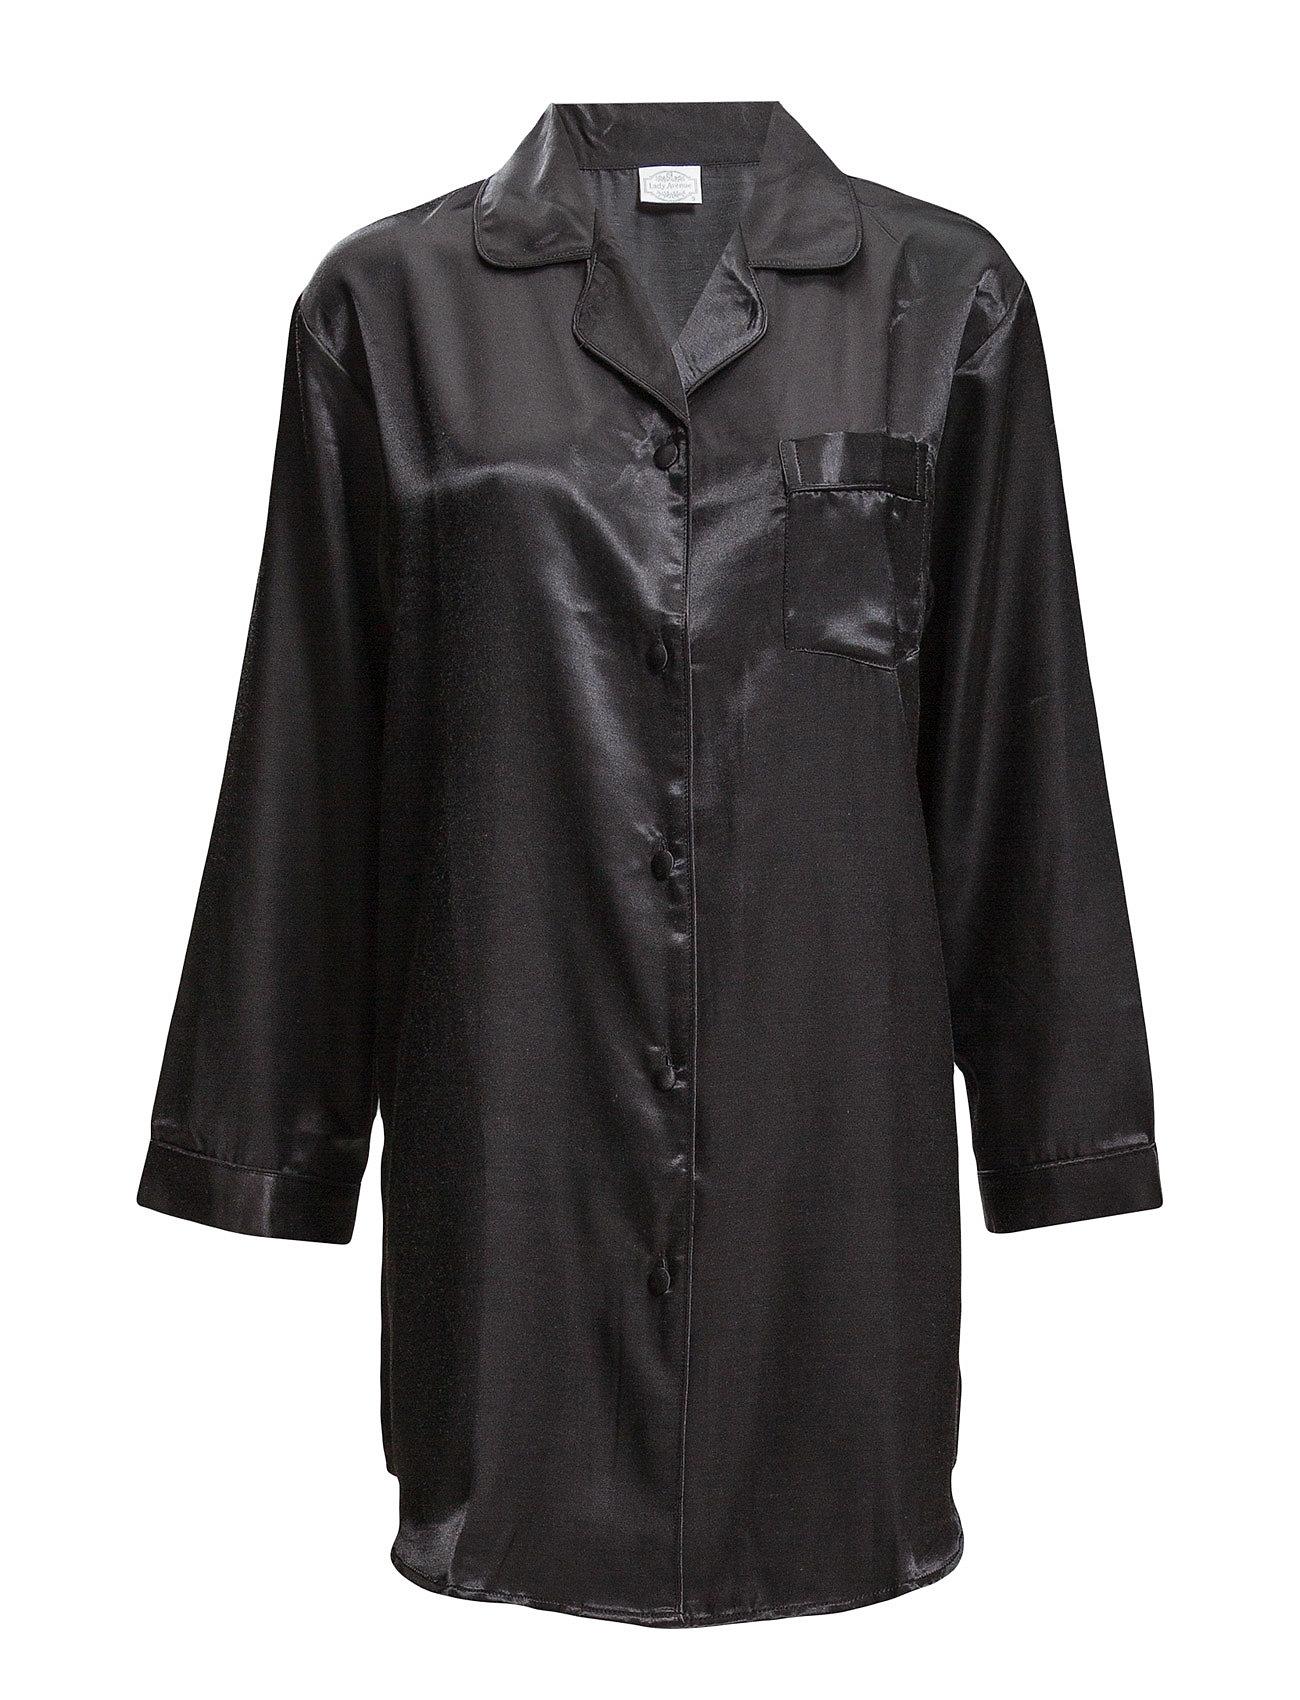 Lady Avenue Satin Long Sleeve Nightshirt - BLACK